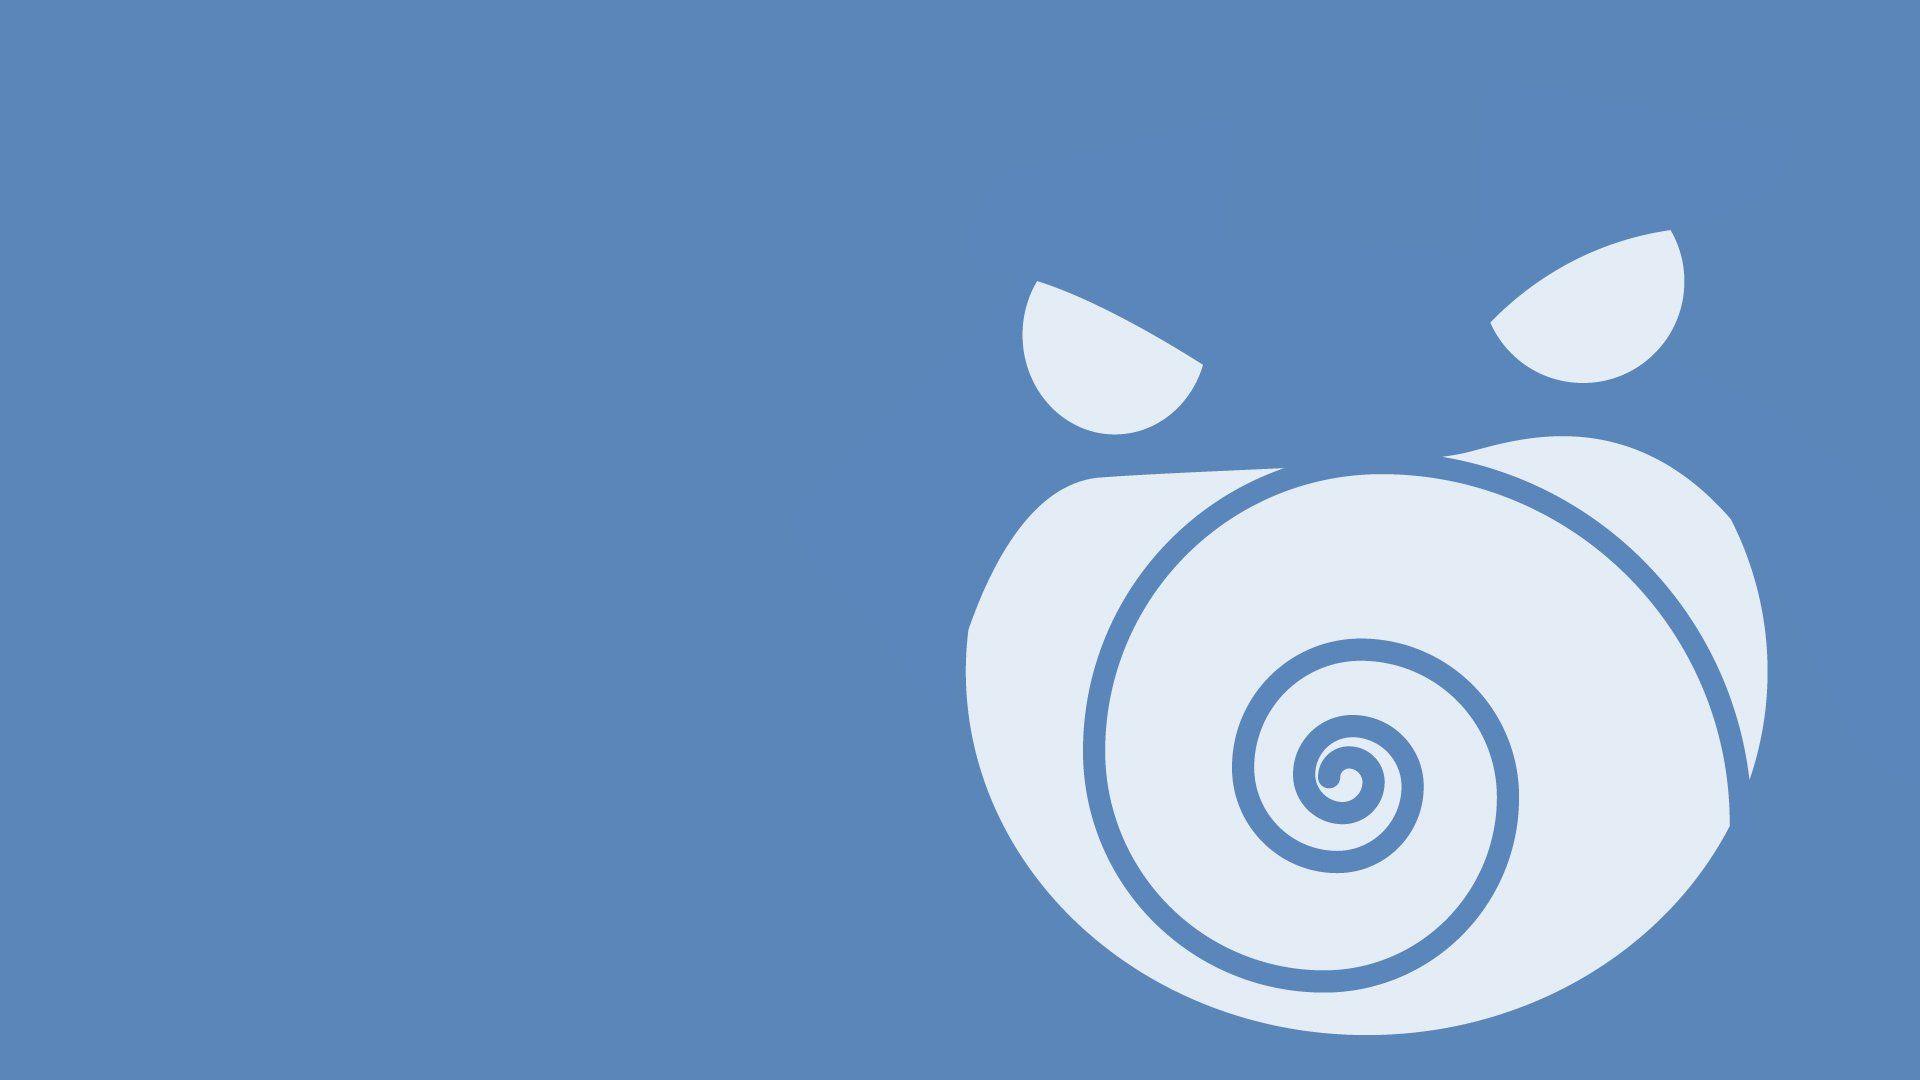 Minimalist Pokemon Wallpaper Wallpapers Pinterest Pokemon